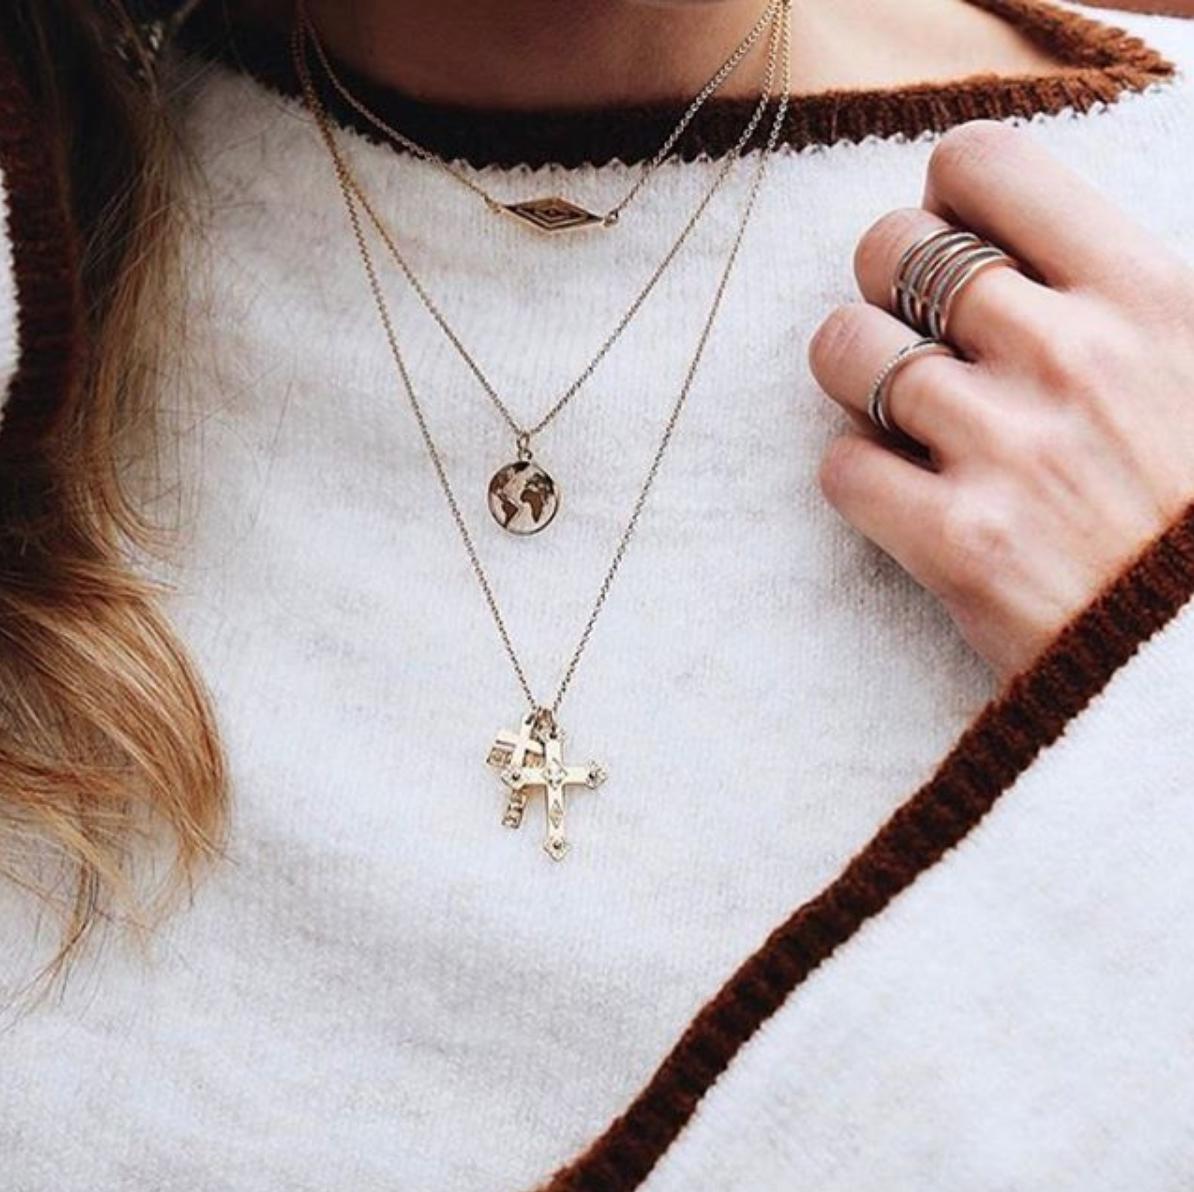 60d14b42744766 SHOP NOW Multi Cross Necklace, World Necklace & Eye Chocker • www.maria- pascual.com #mariapascual #mariapascualnecklaces #necklace #gold #jewelry  #choker ...